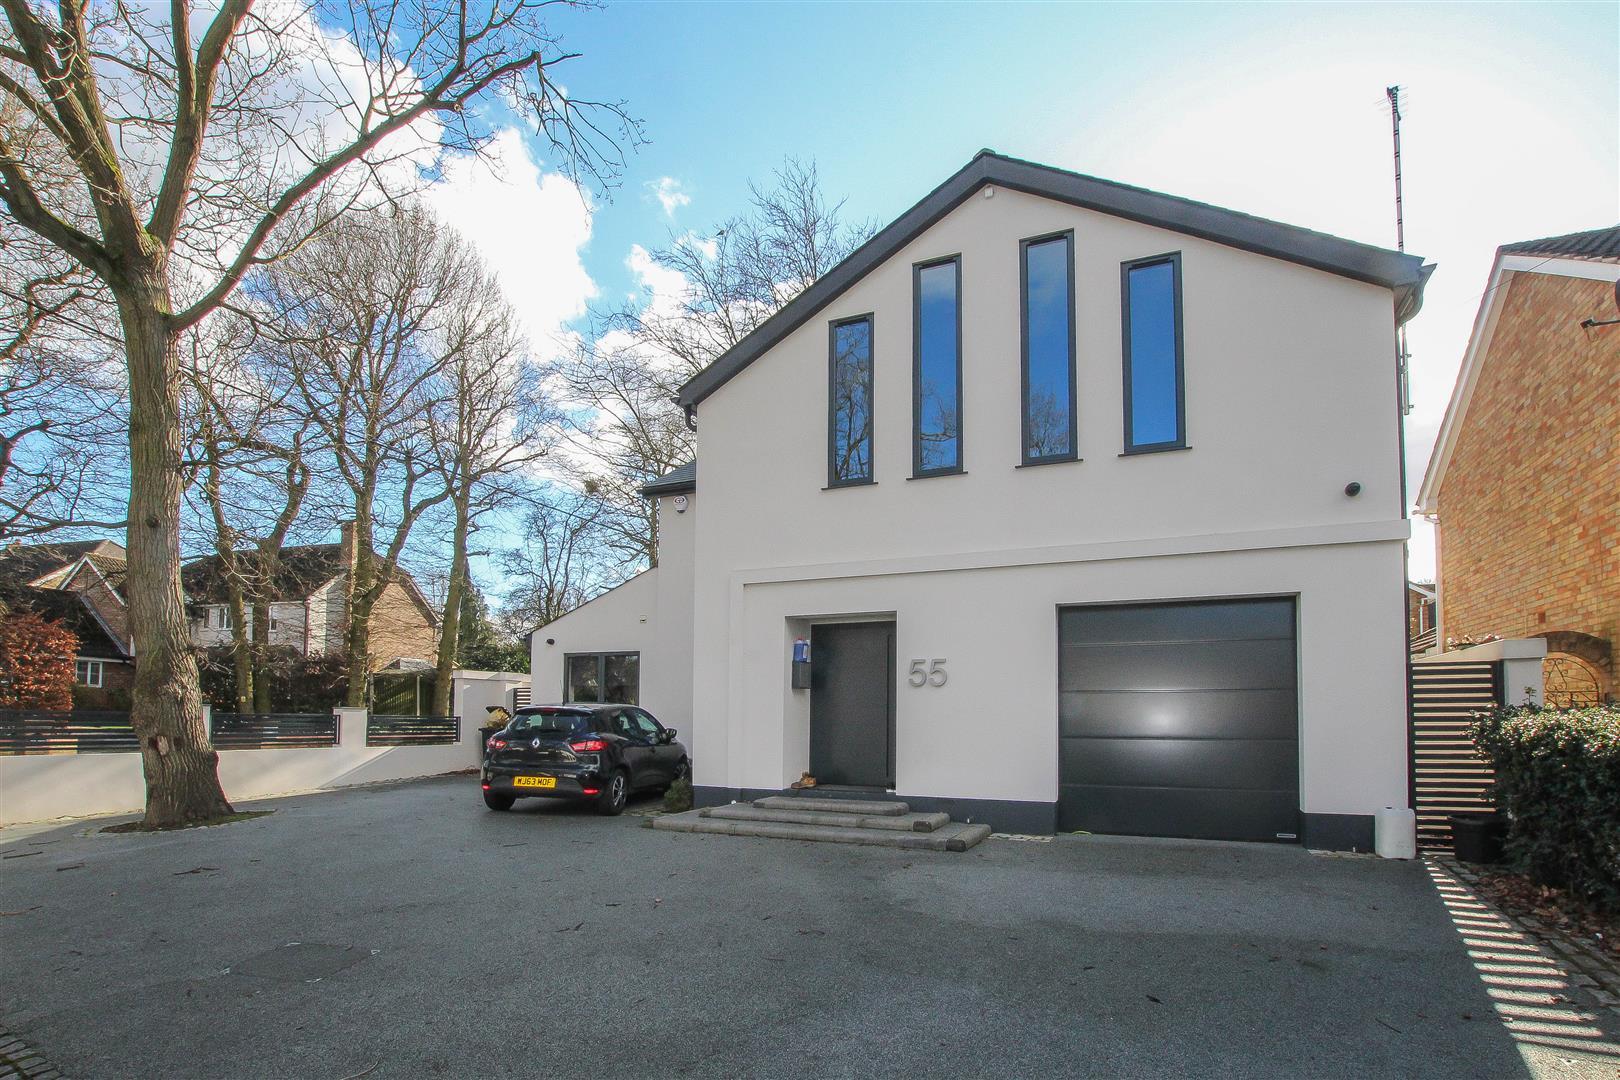 Hall Green Lane, Hutton, Brentwood